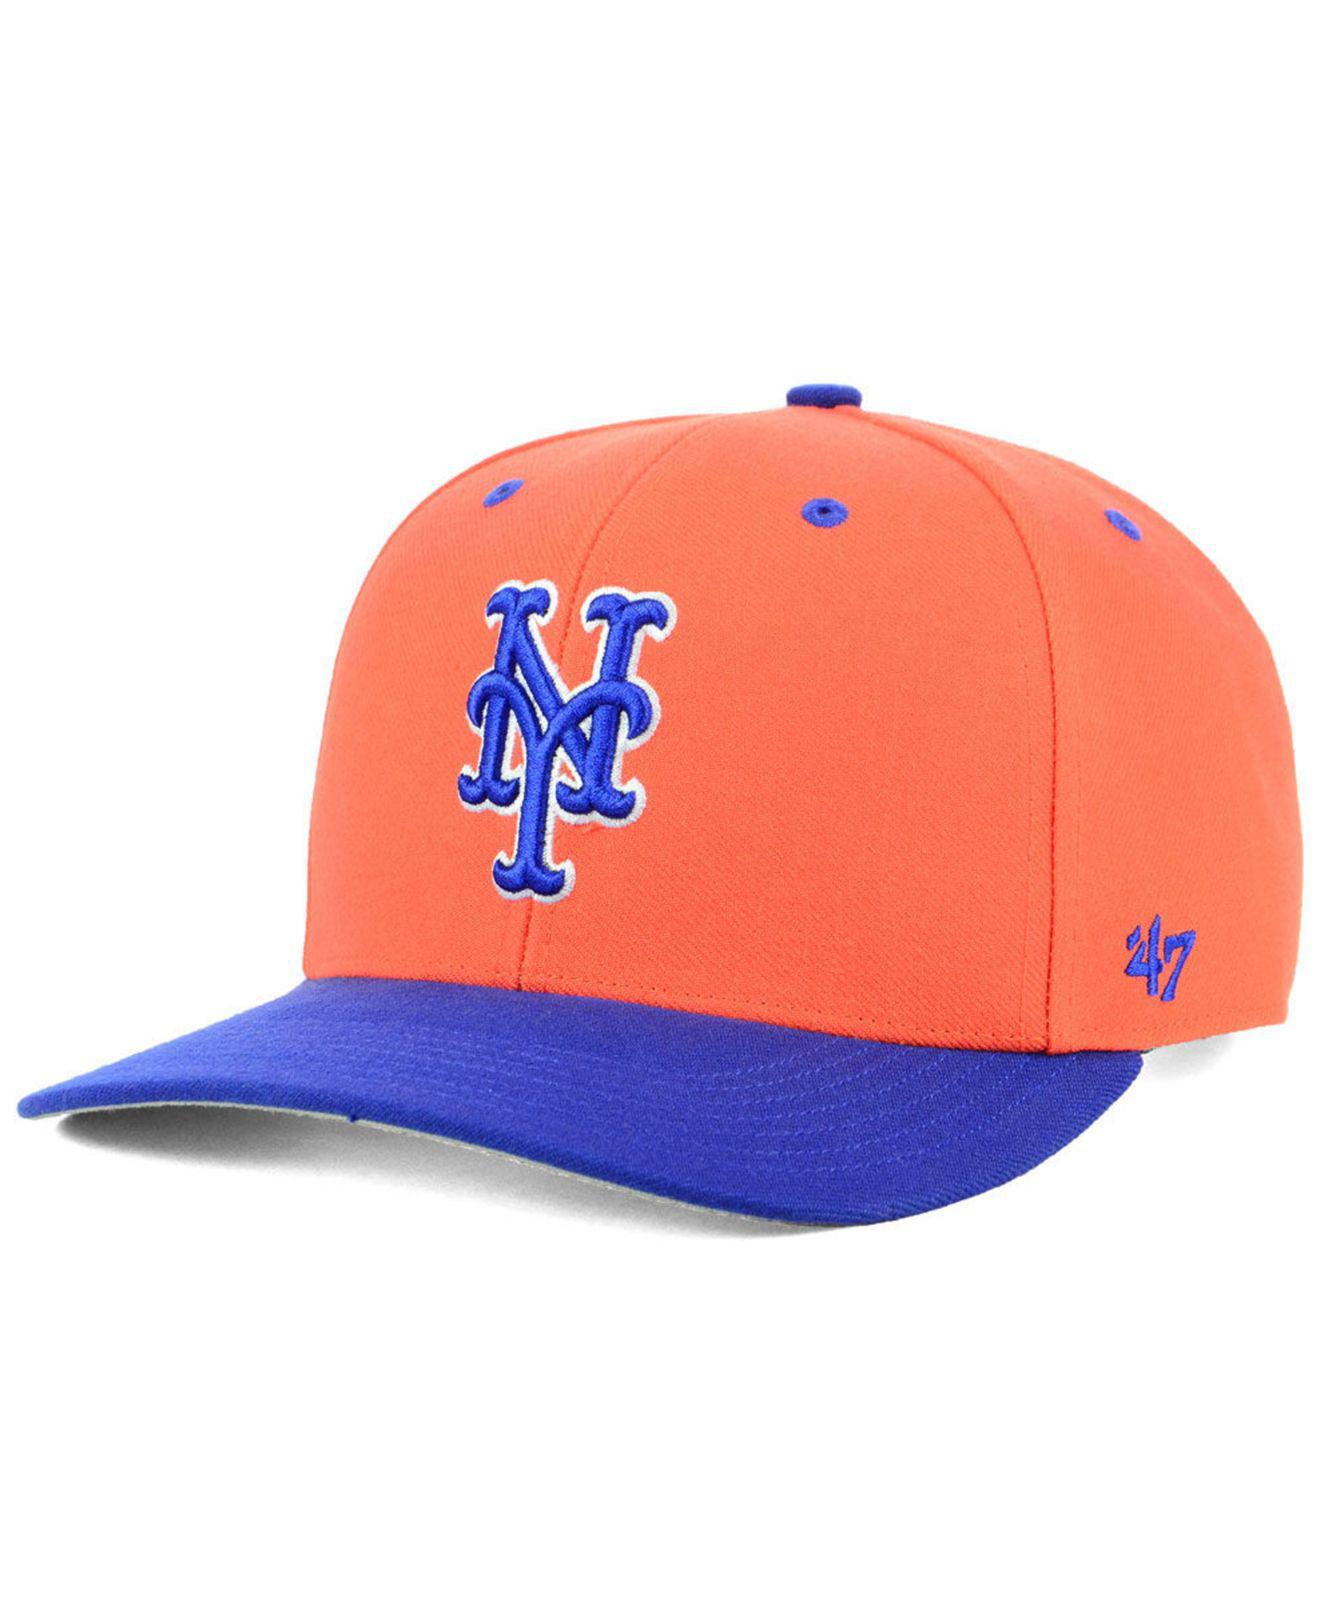 87d55a07b49 Lyst - 47 Brand New York Mets 2 Tone Mvp Cap for Men